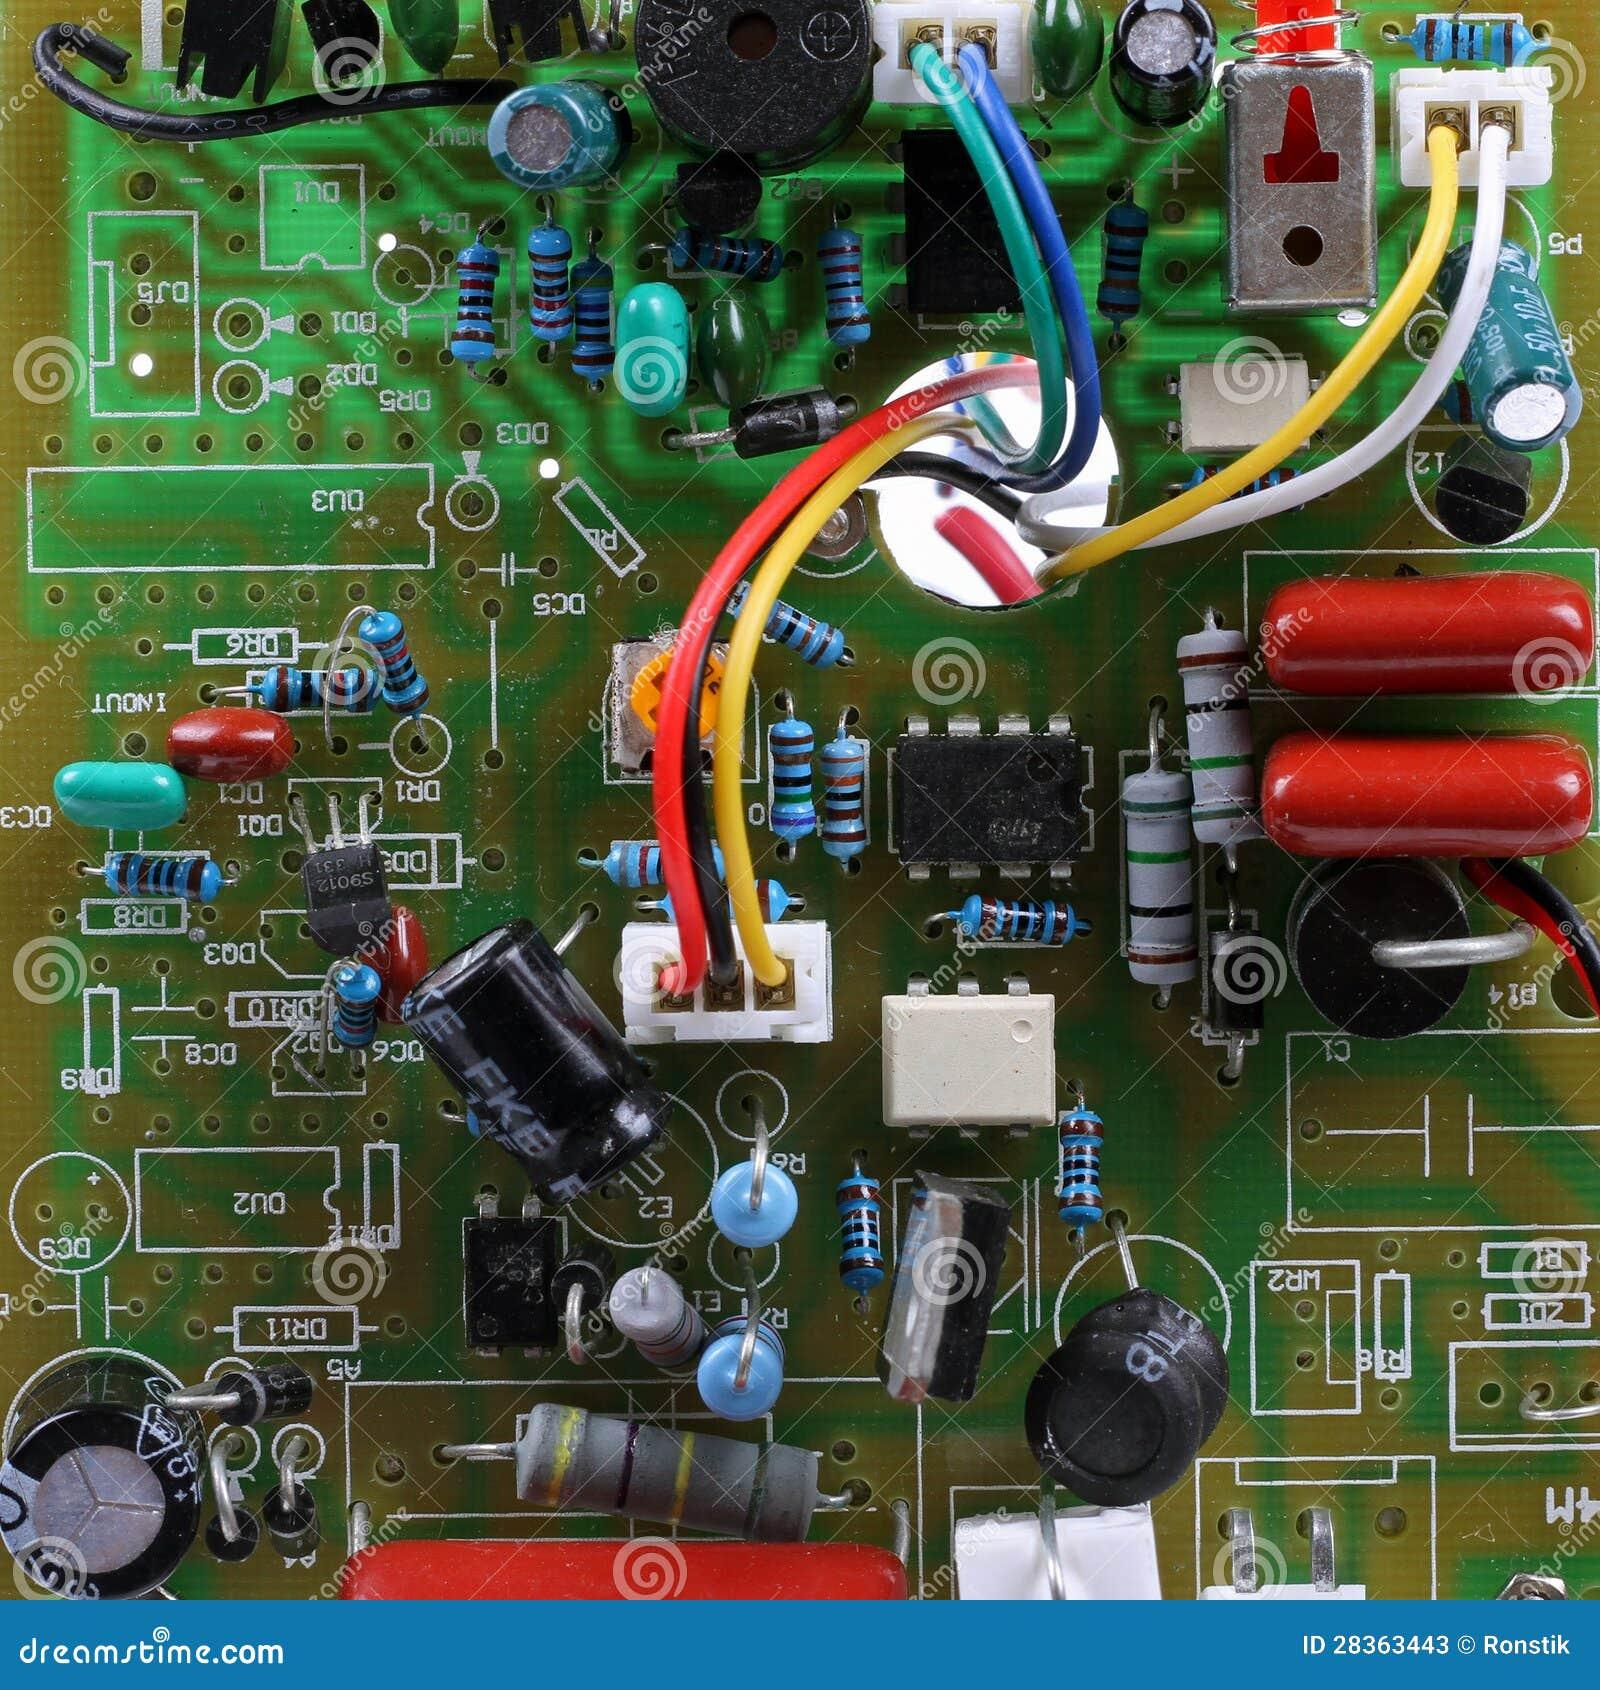 pictures of electrical circuit board components kidskunst info rh kidskunst info Blue Electronic Circuit Boards Electronic Circuit Projects